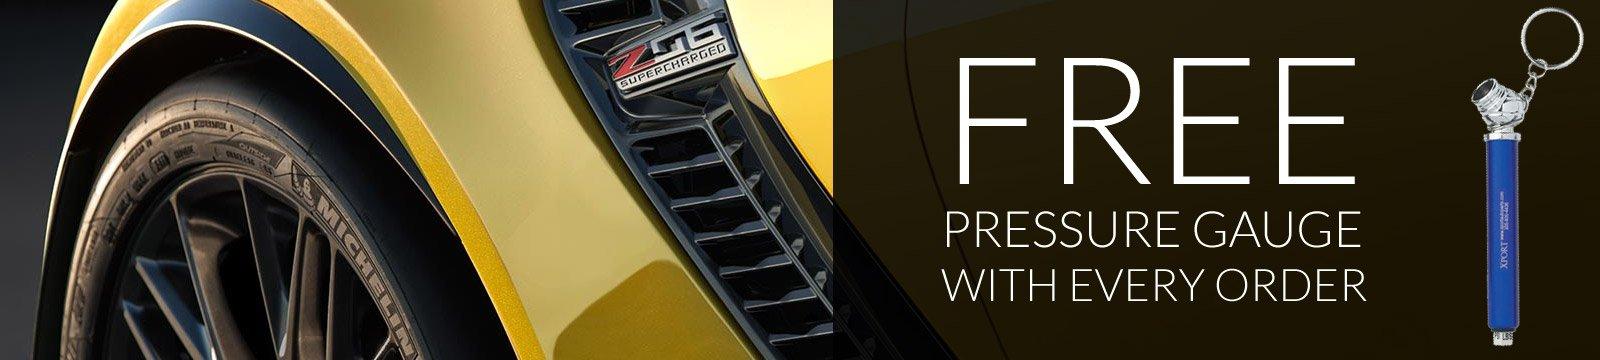 Xport Auto Parts Inc. Banner 5